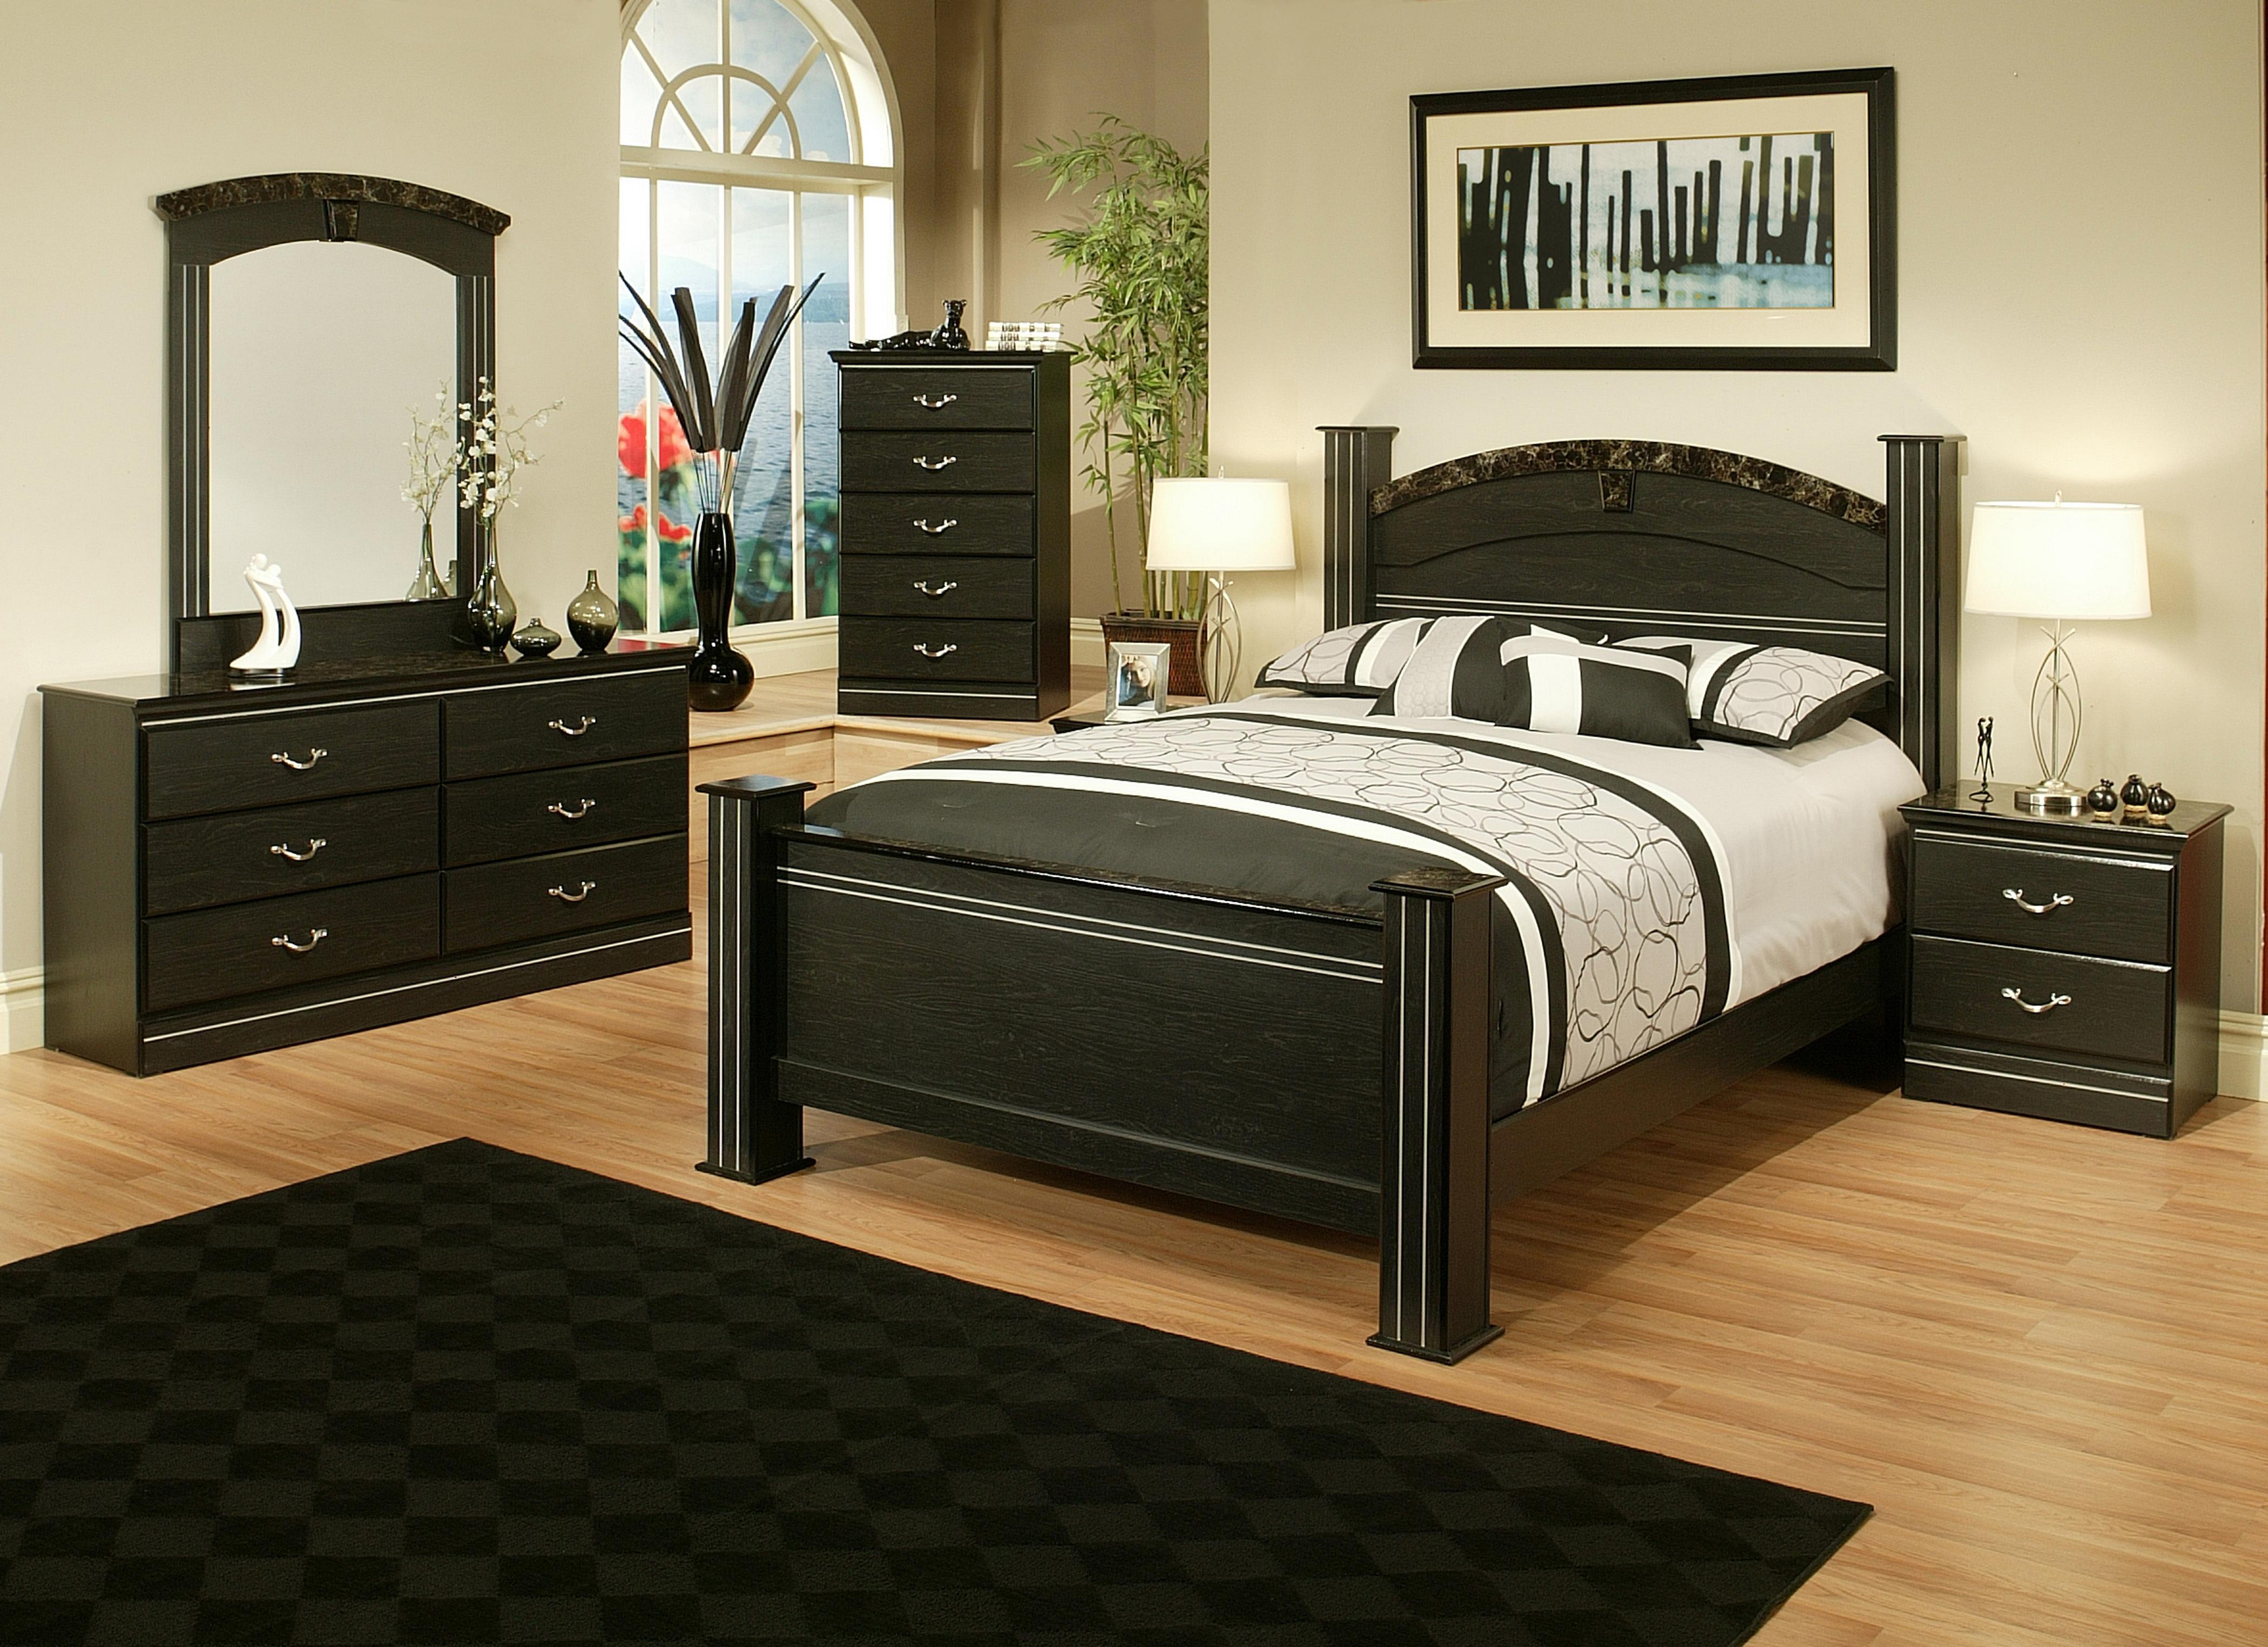 simmons furniture sofa on laguna black bedroom furniture sets